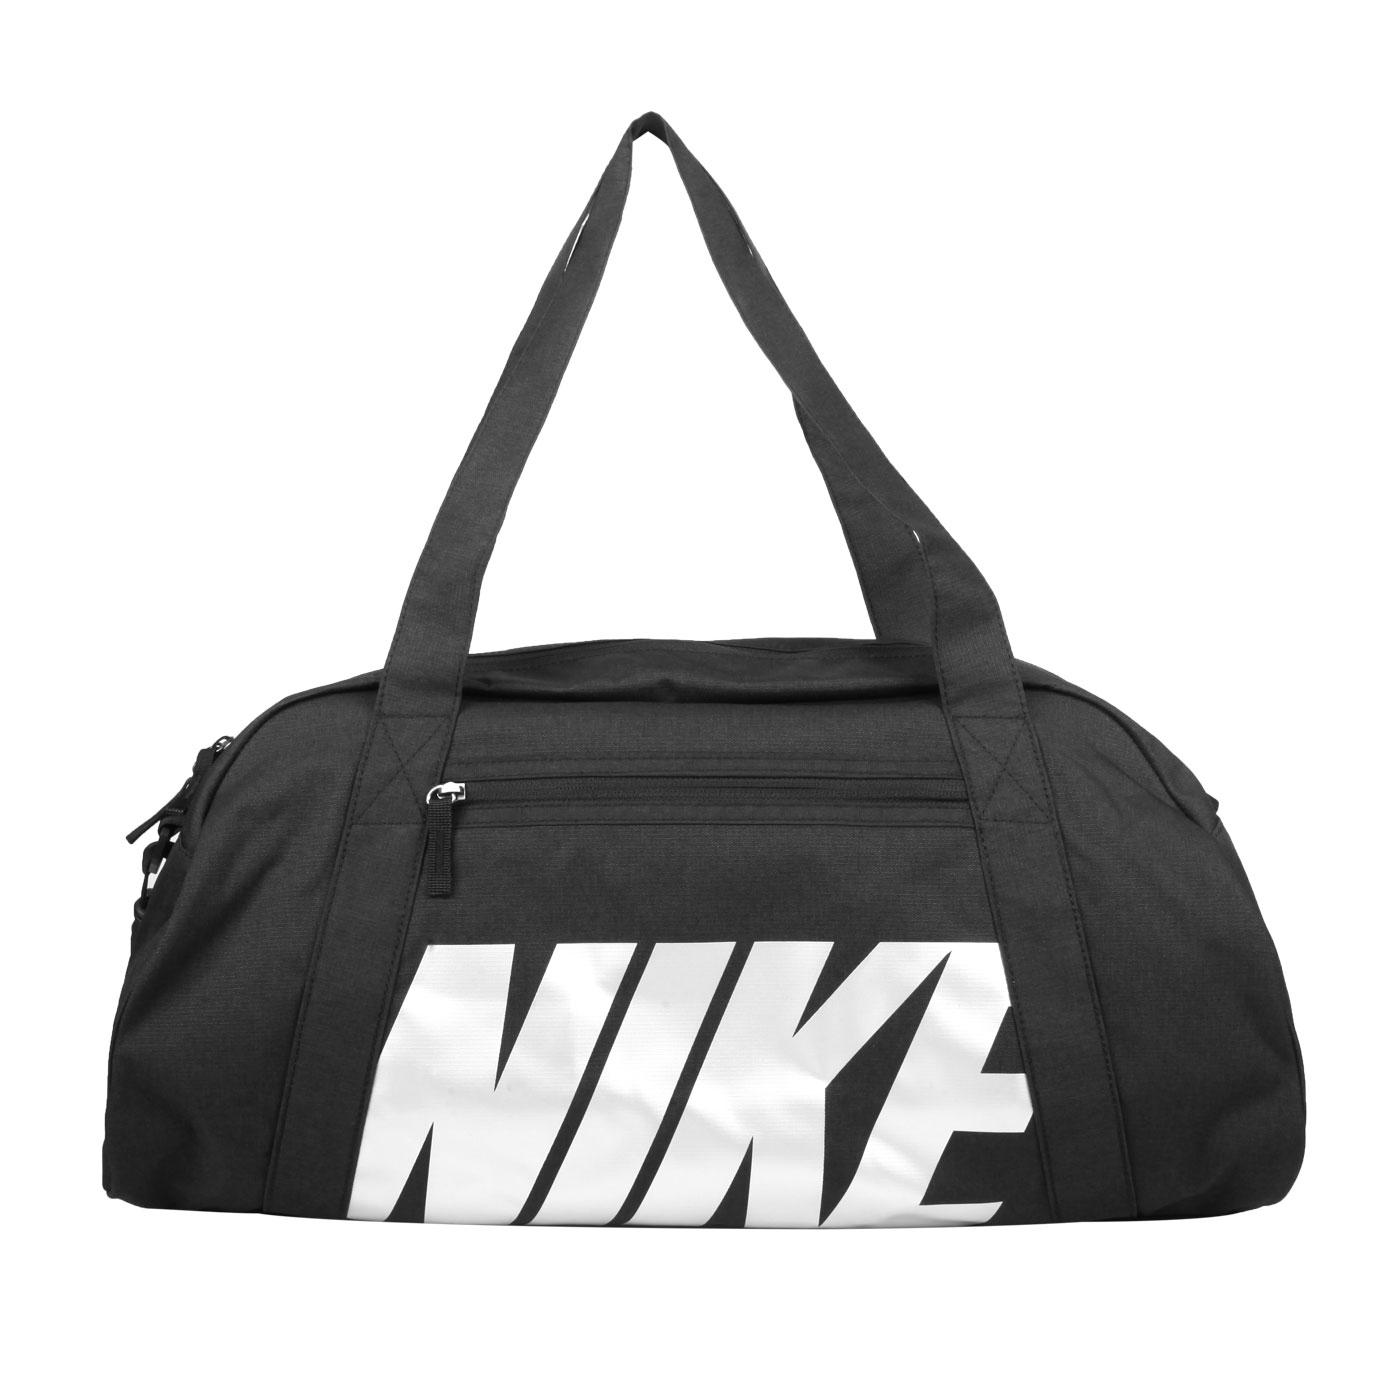 NIKE 女款運動健身包 BA5490-019 - 黑銀